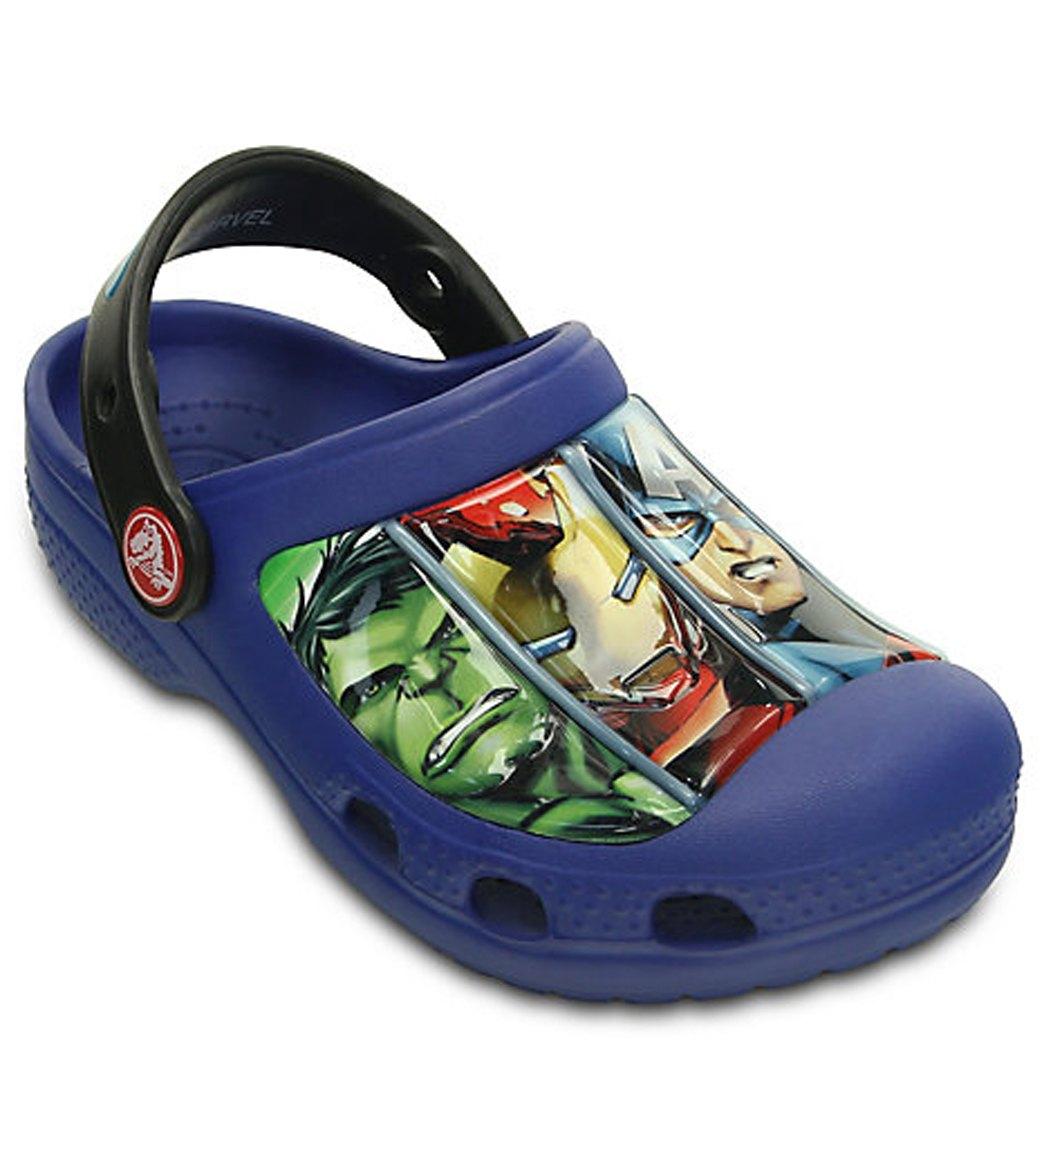 035ab8cef563f Crocs Kids' Marvel Avengers III Clog (Toddler/ Little Kid/ Big Kid) at ...